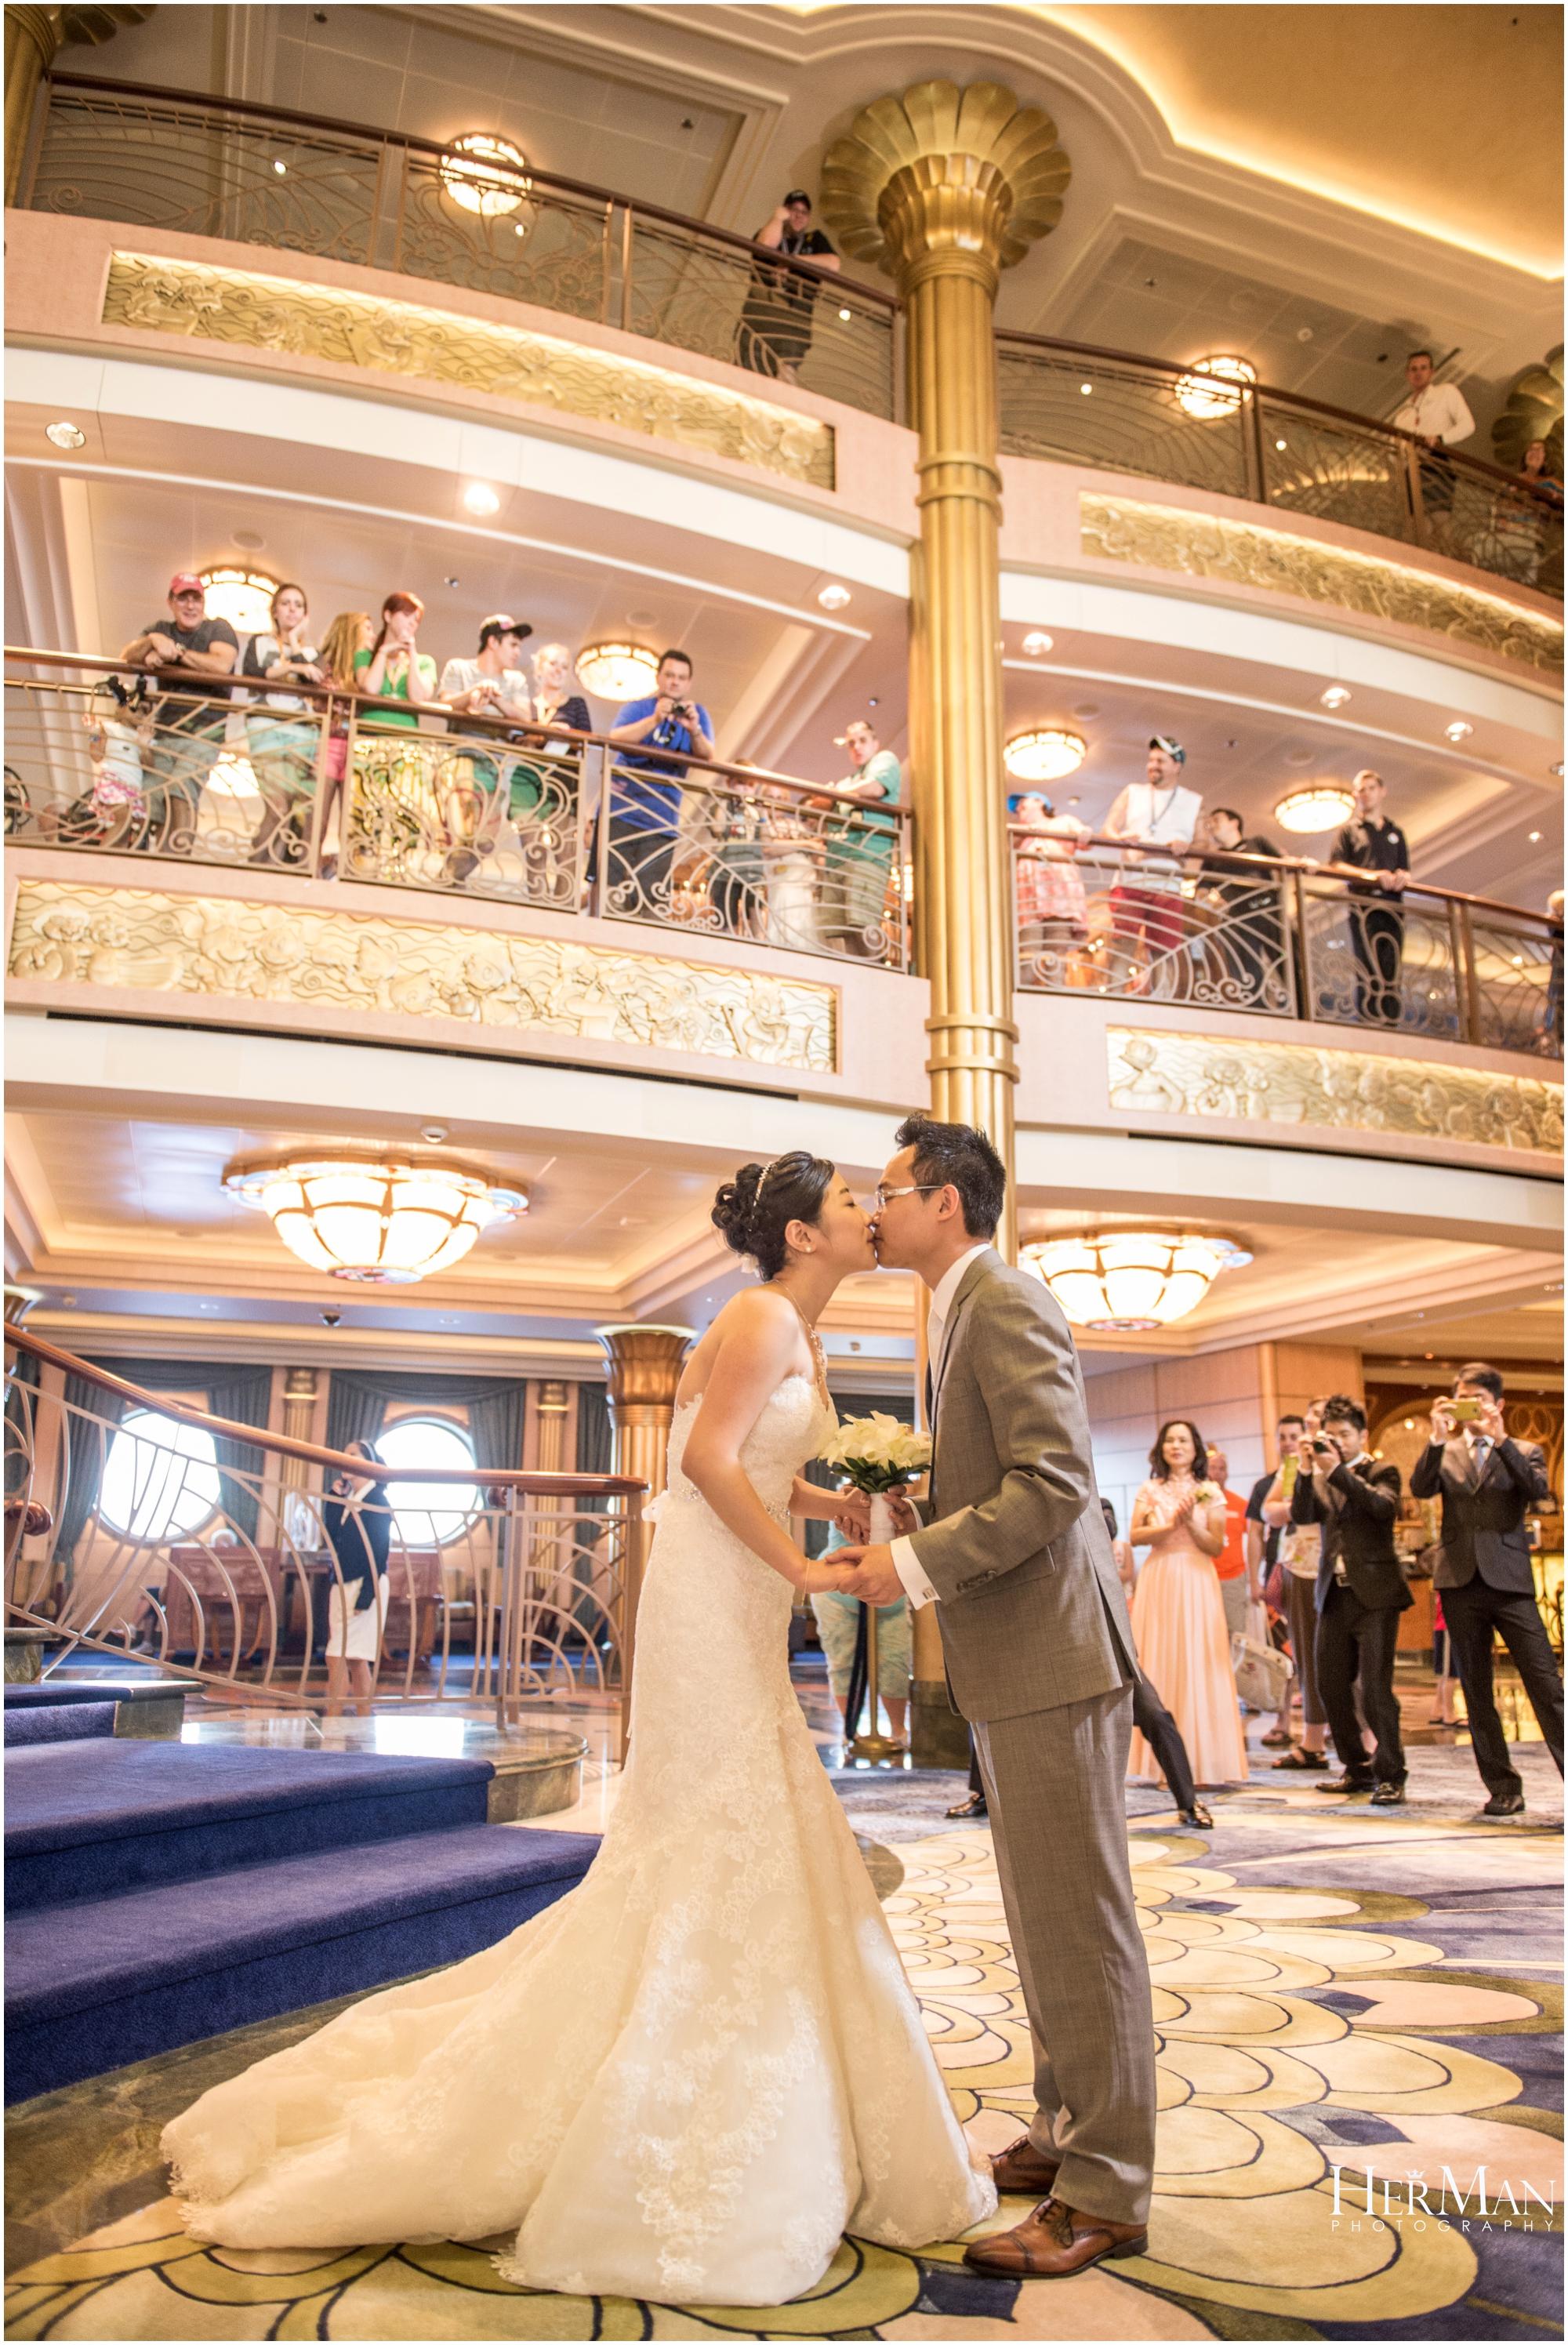 Disney Cruise Wedding.Disney Cruise Destination Wedding Mamie Toby Herman